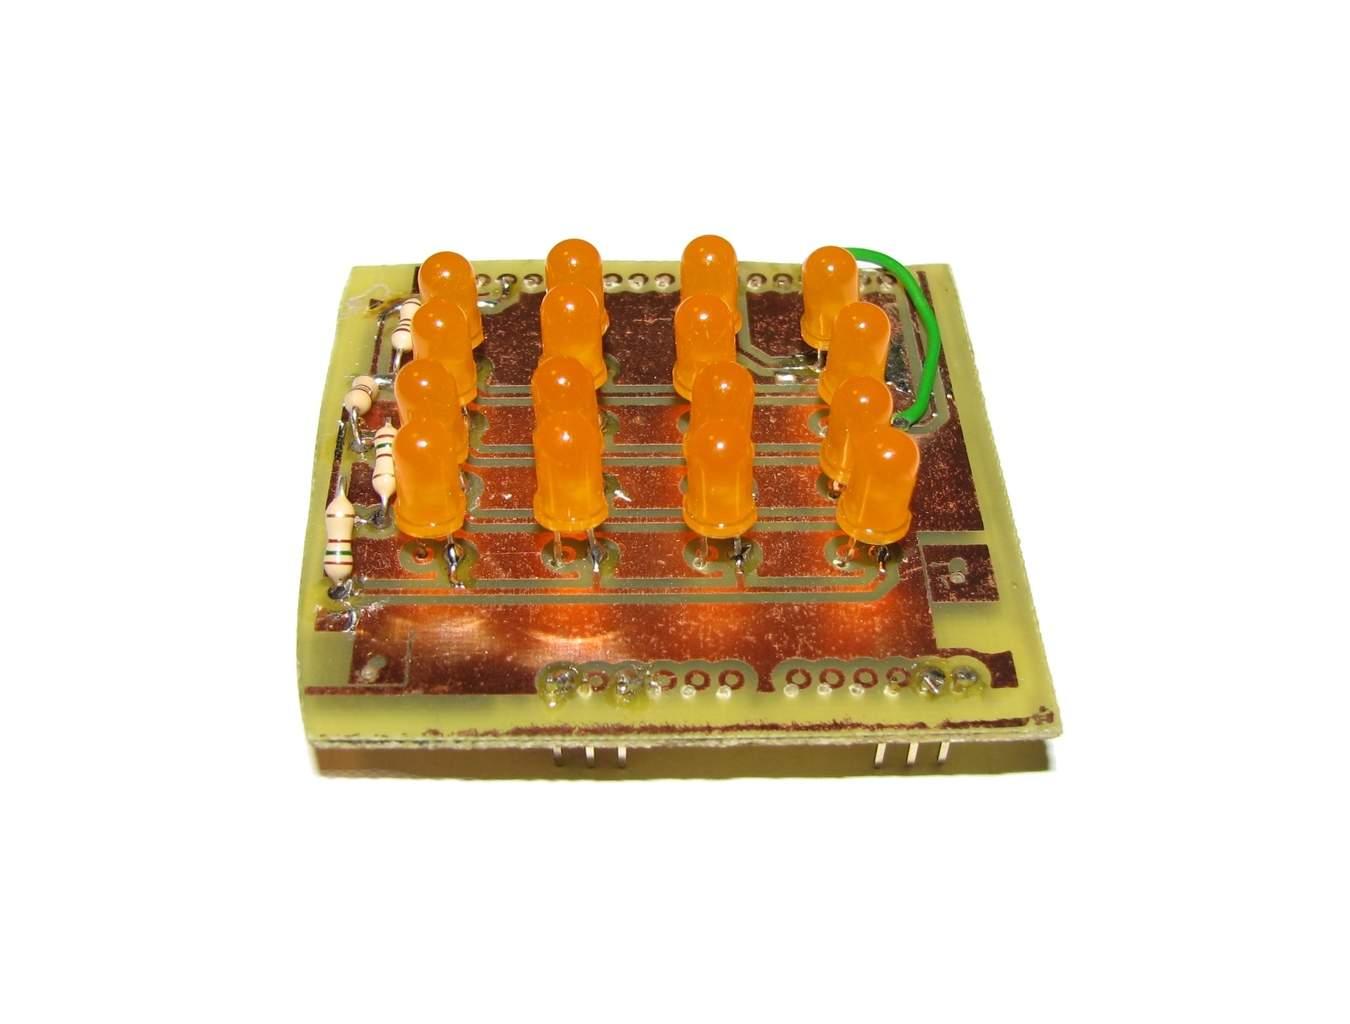 Arduino Shield Tutorial Led Matrix Build Electronic Circuits Integrated Tutorials Project